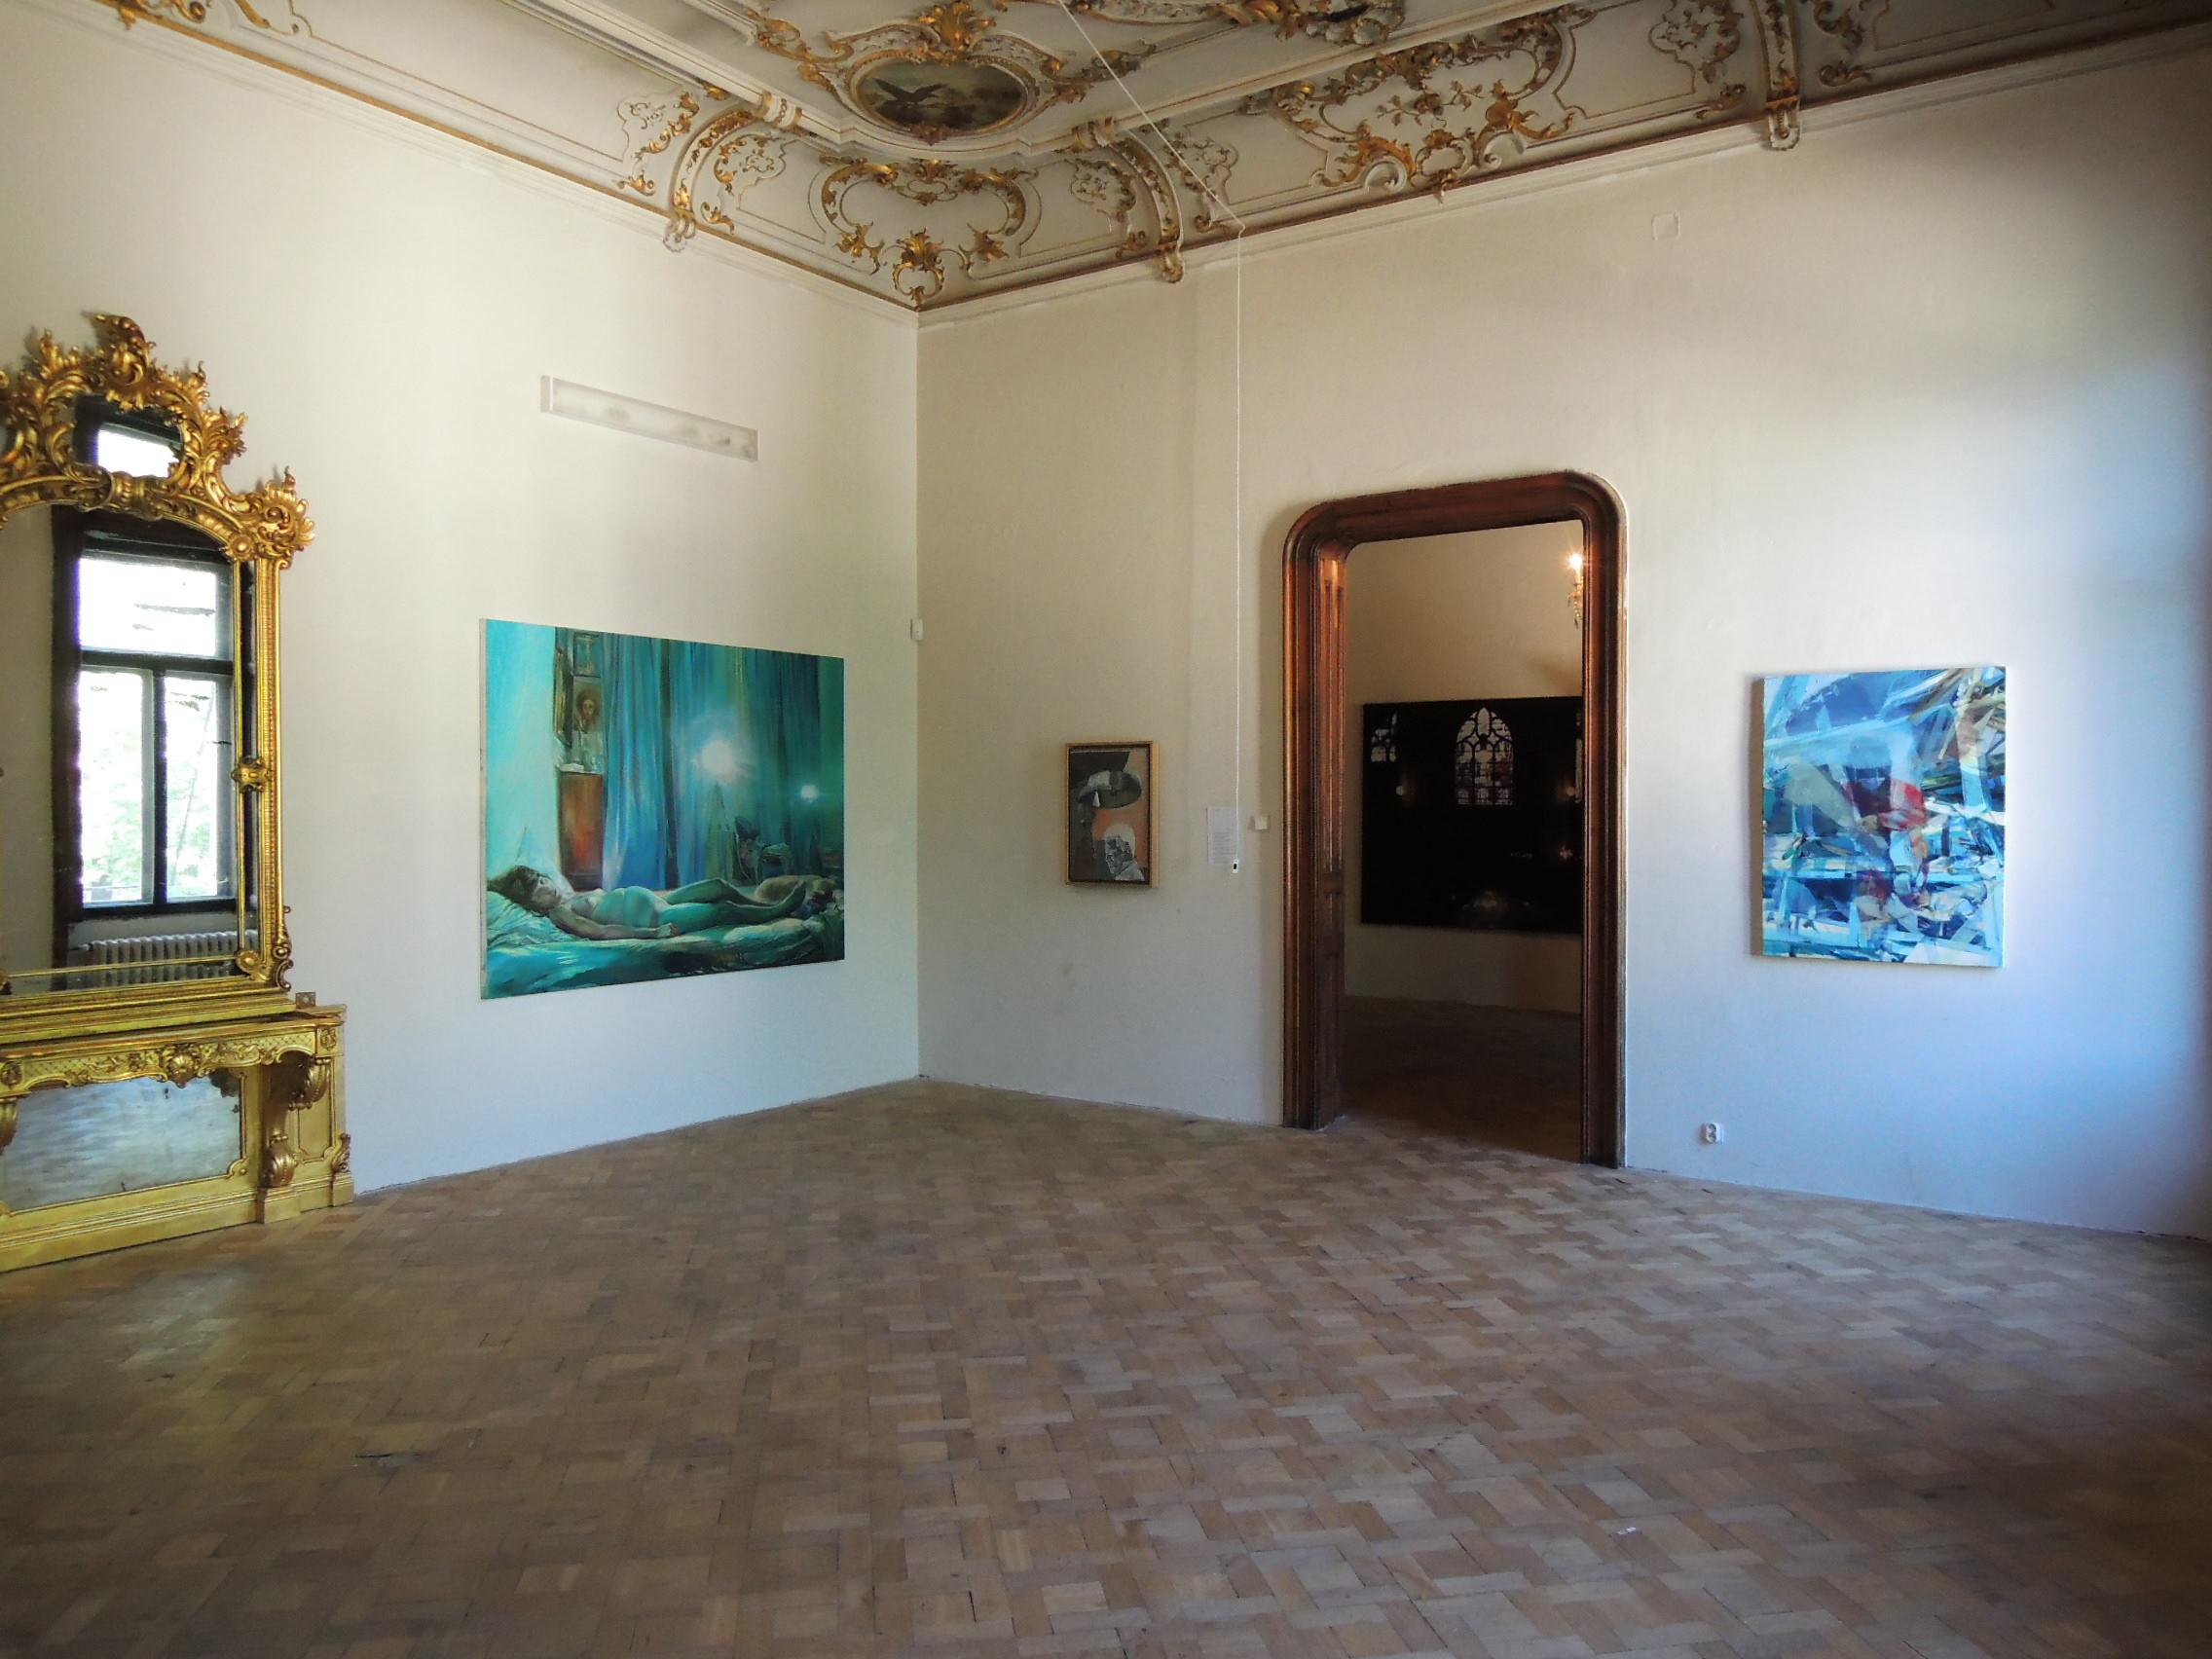 La Belle Peinture 2 , Bratislava (SK), Pisztory Palace.Curators : Eva Hober and Ivan Jançar.Artists in view: Axel Pahlavi, Duncan Wylie